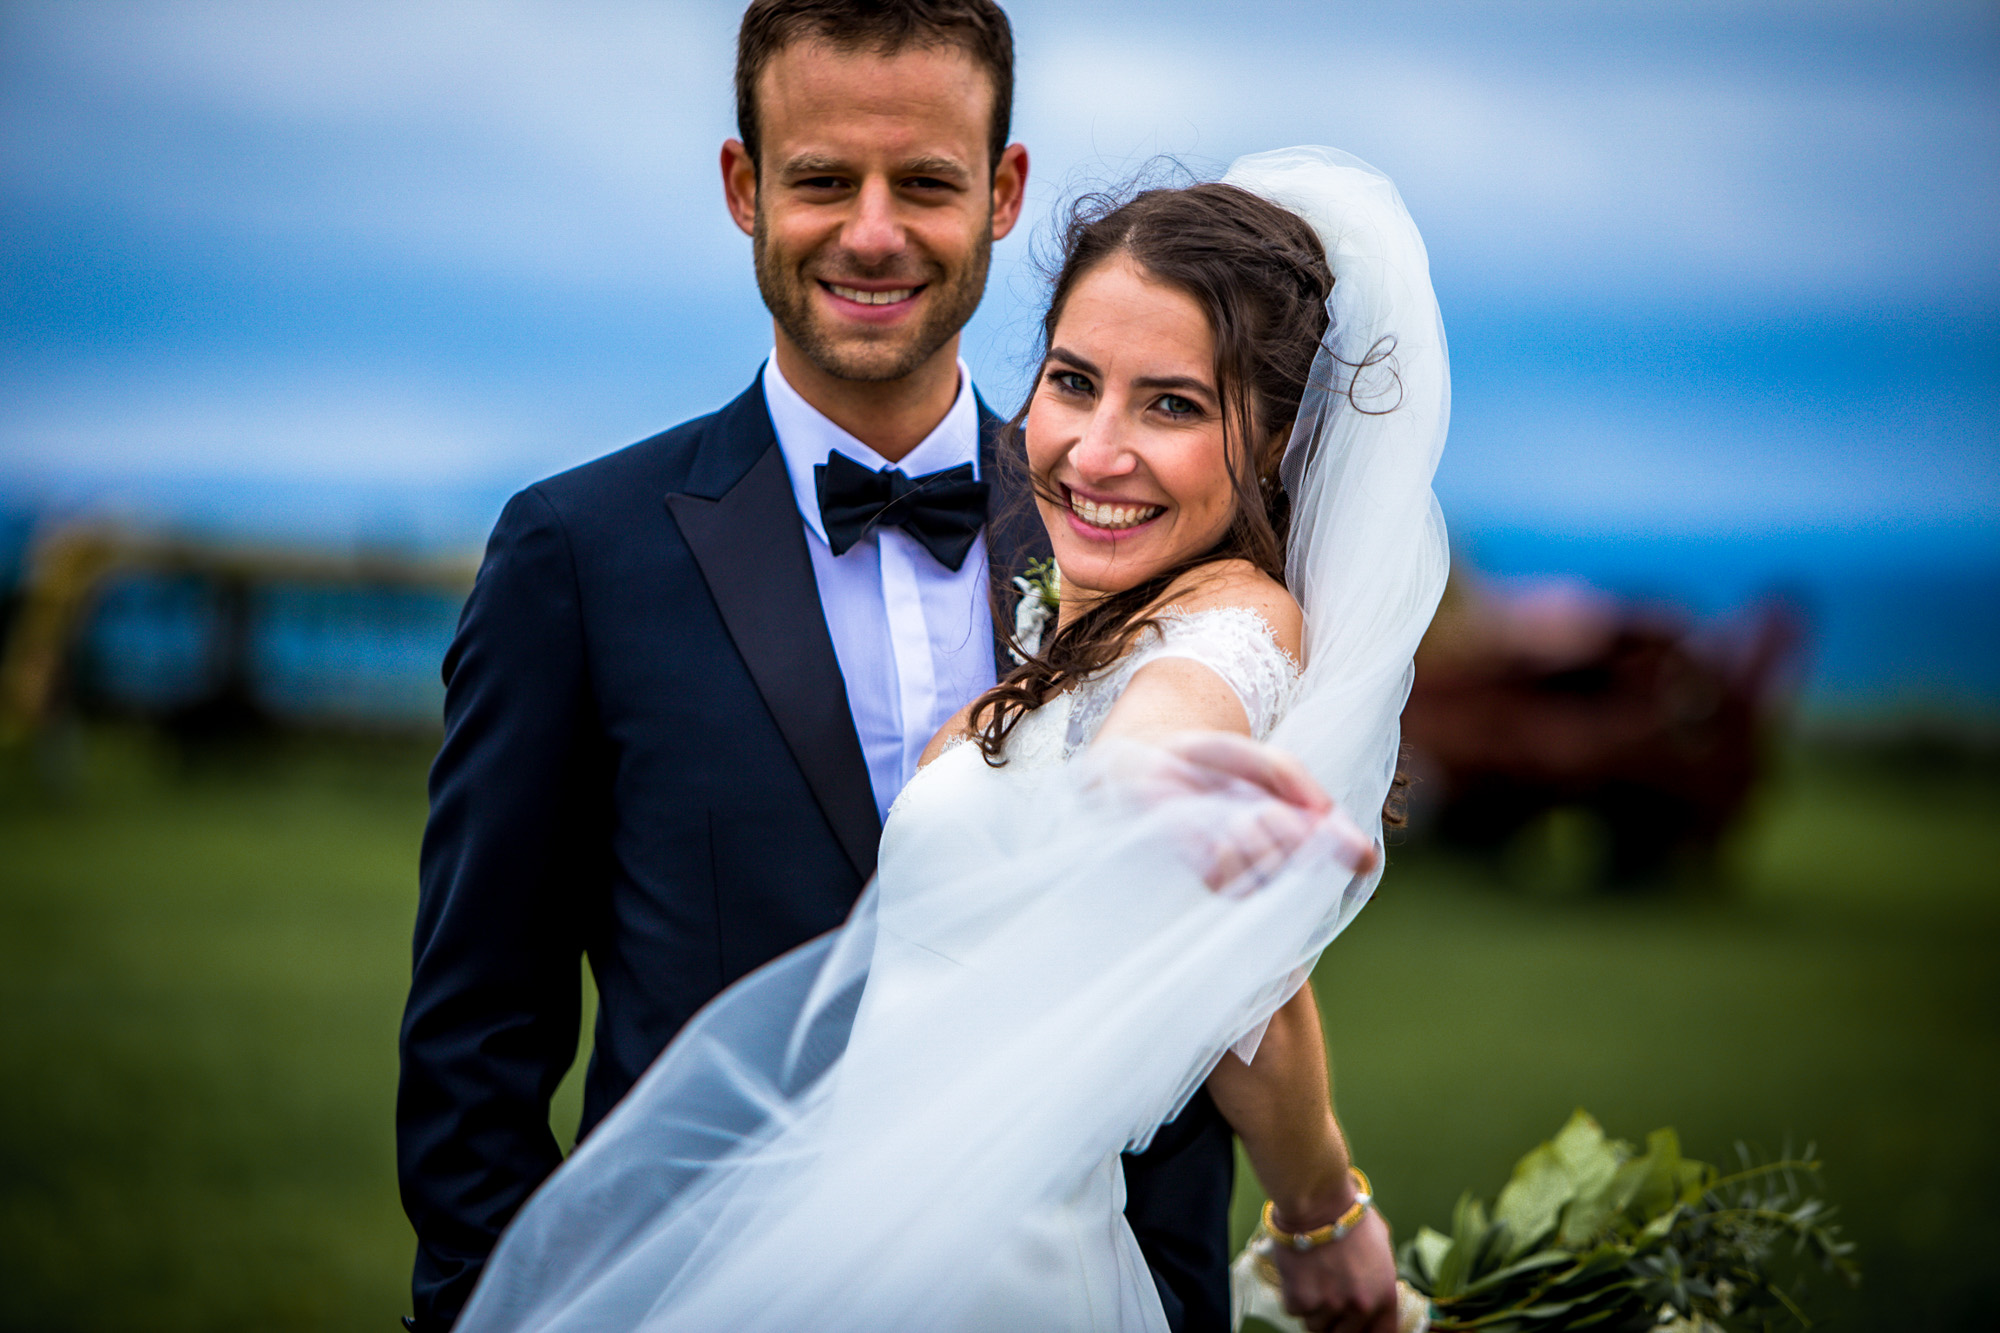 scranton_wedding_photographer_lettieri_pa (23 of 34).jpg